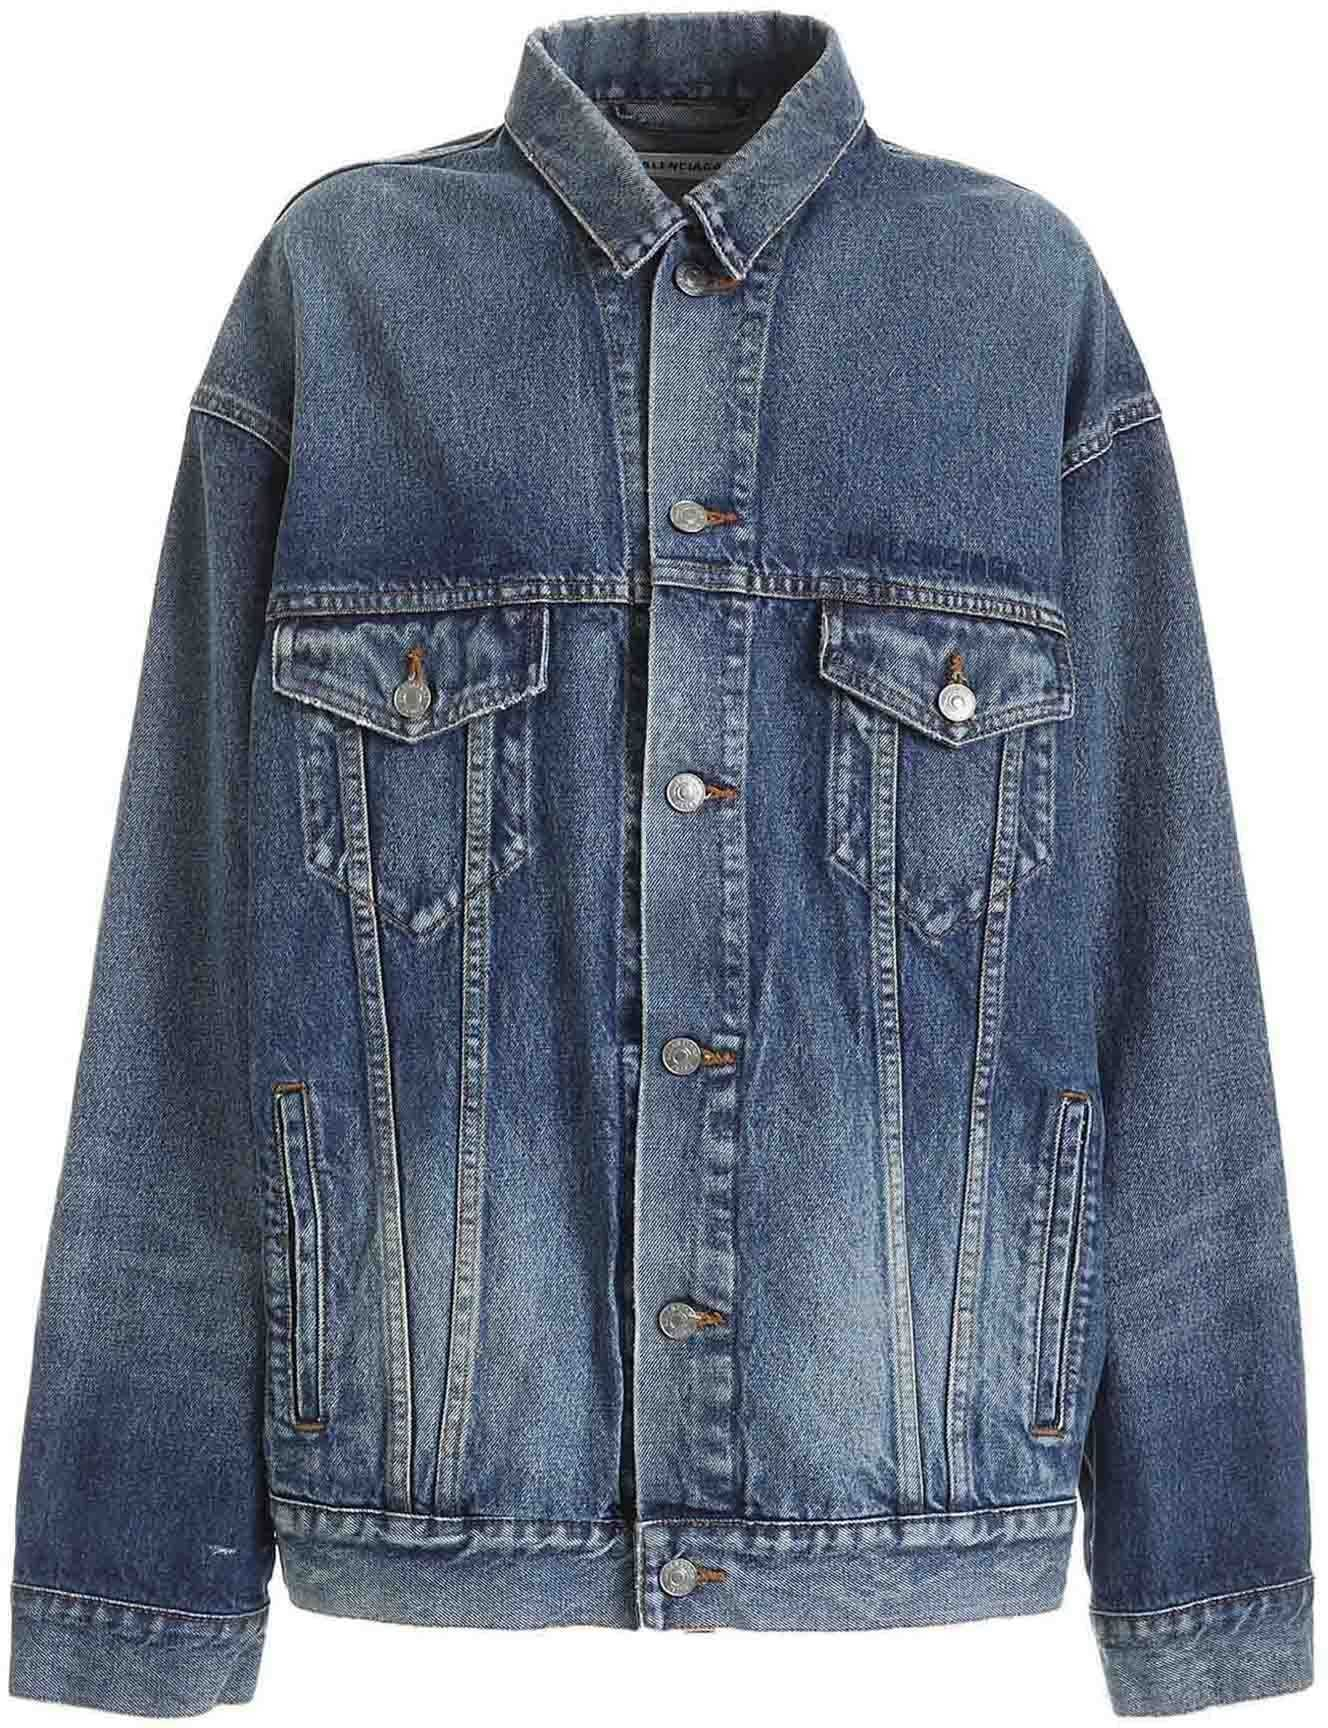 Balenciaga Logo Embroidered Denim Jacket In Blue Blue